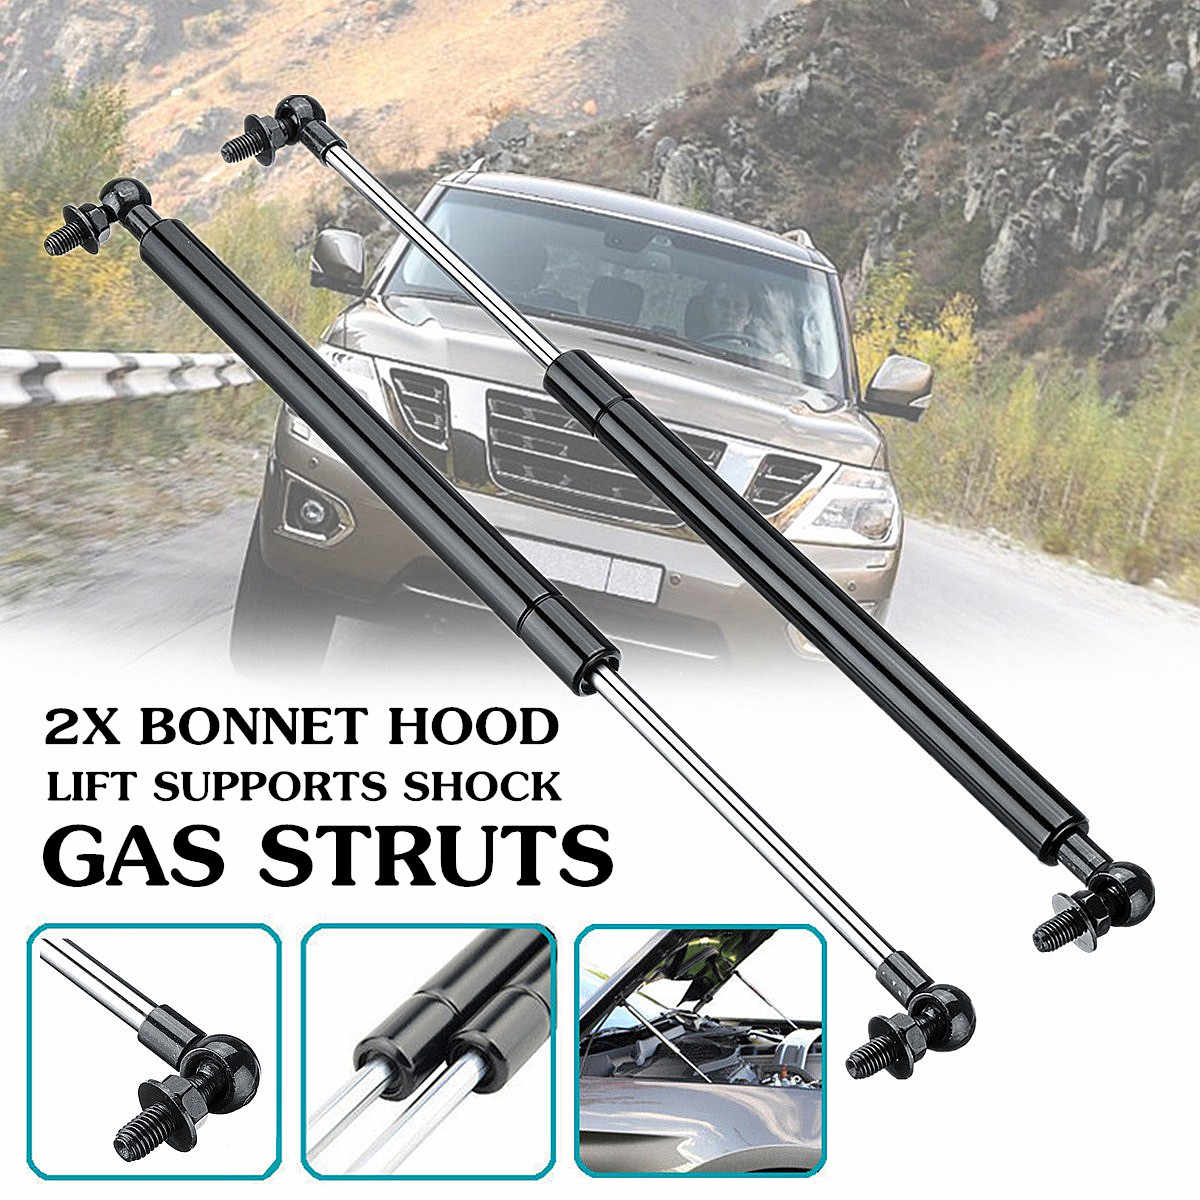 SYUN 2Pcs 340Mm Caravan Motorhome Bonnet Hood Support Gas Strut for Seitz Dometic Heki 2 E015